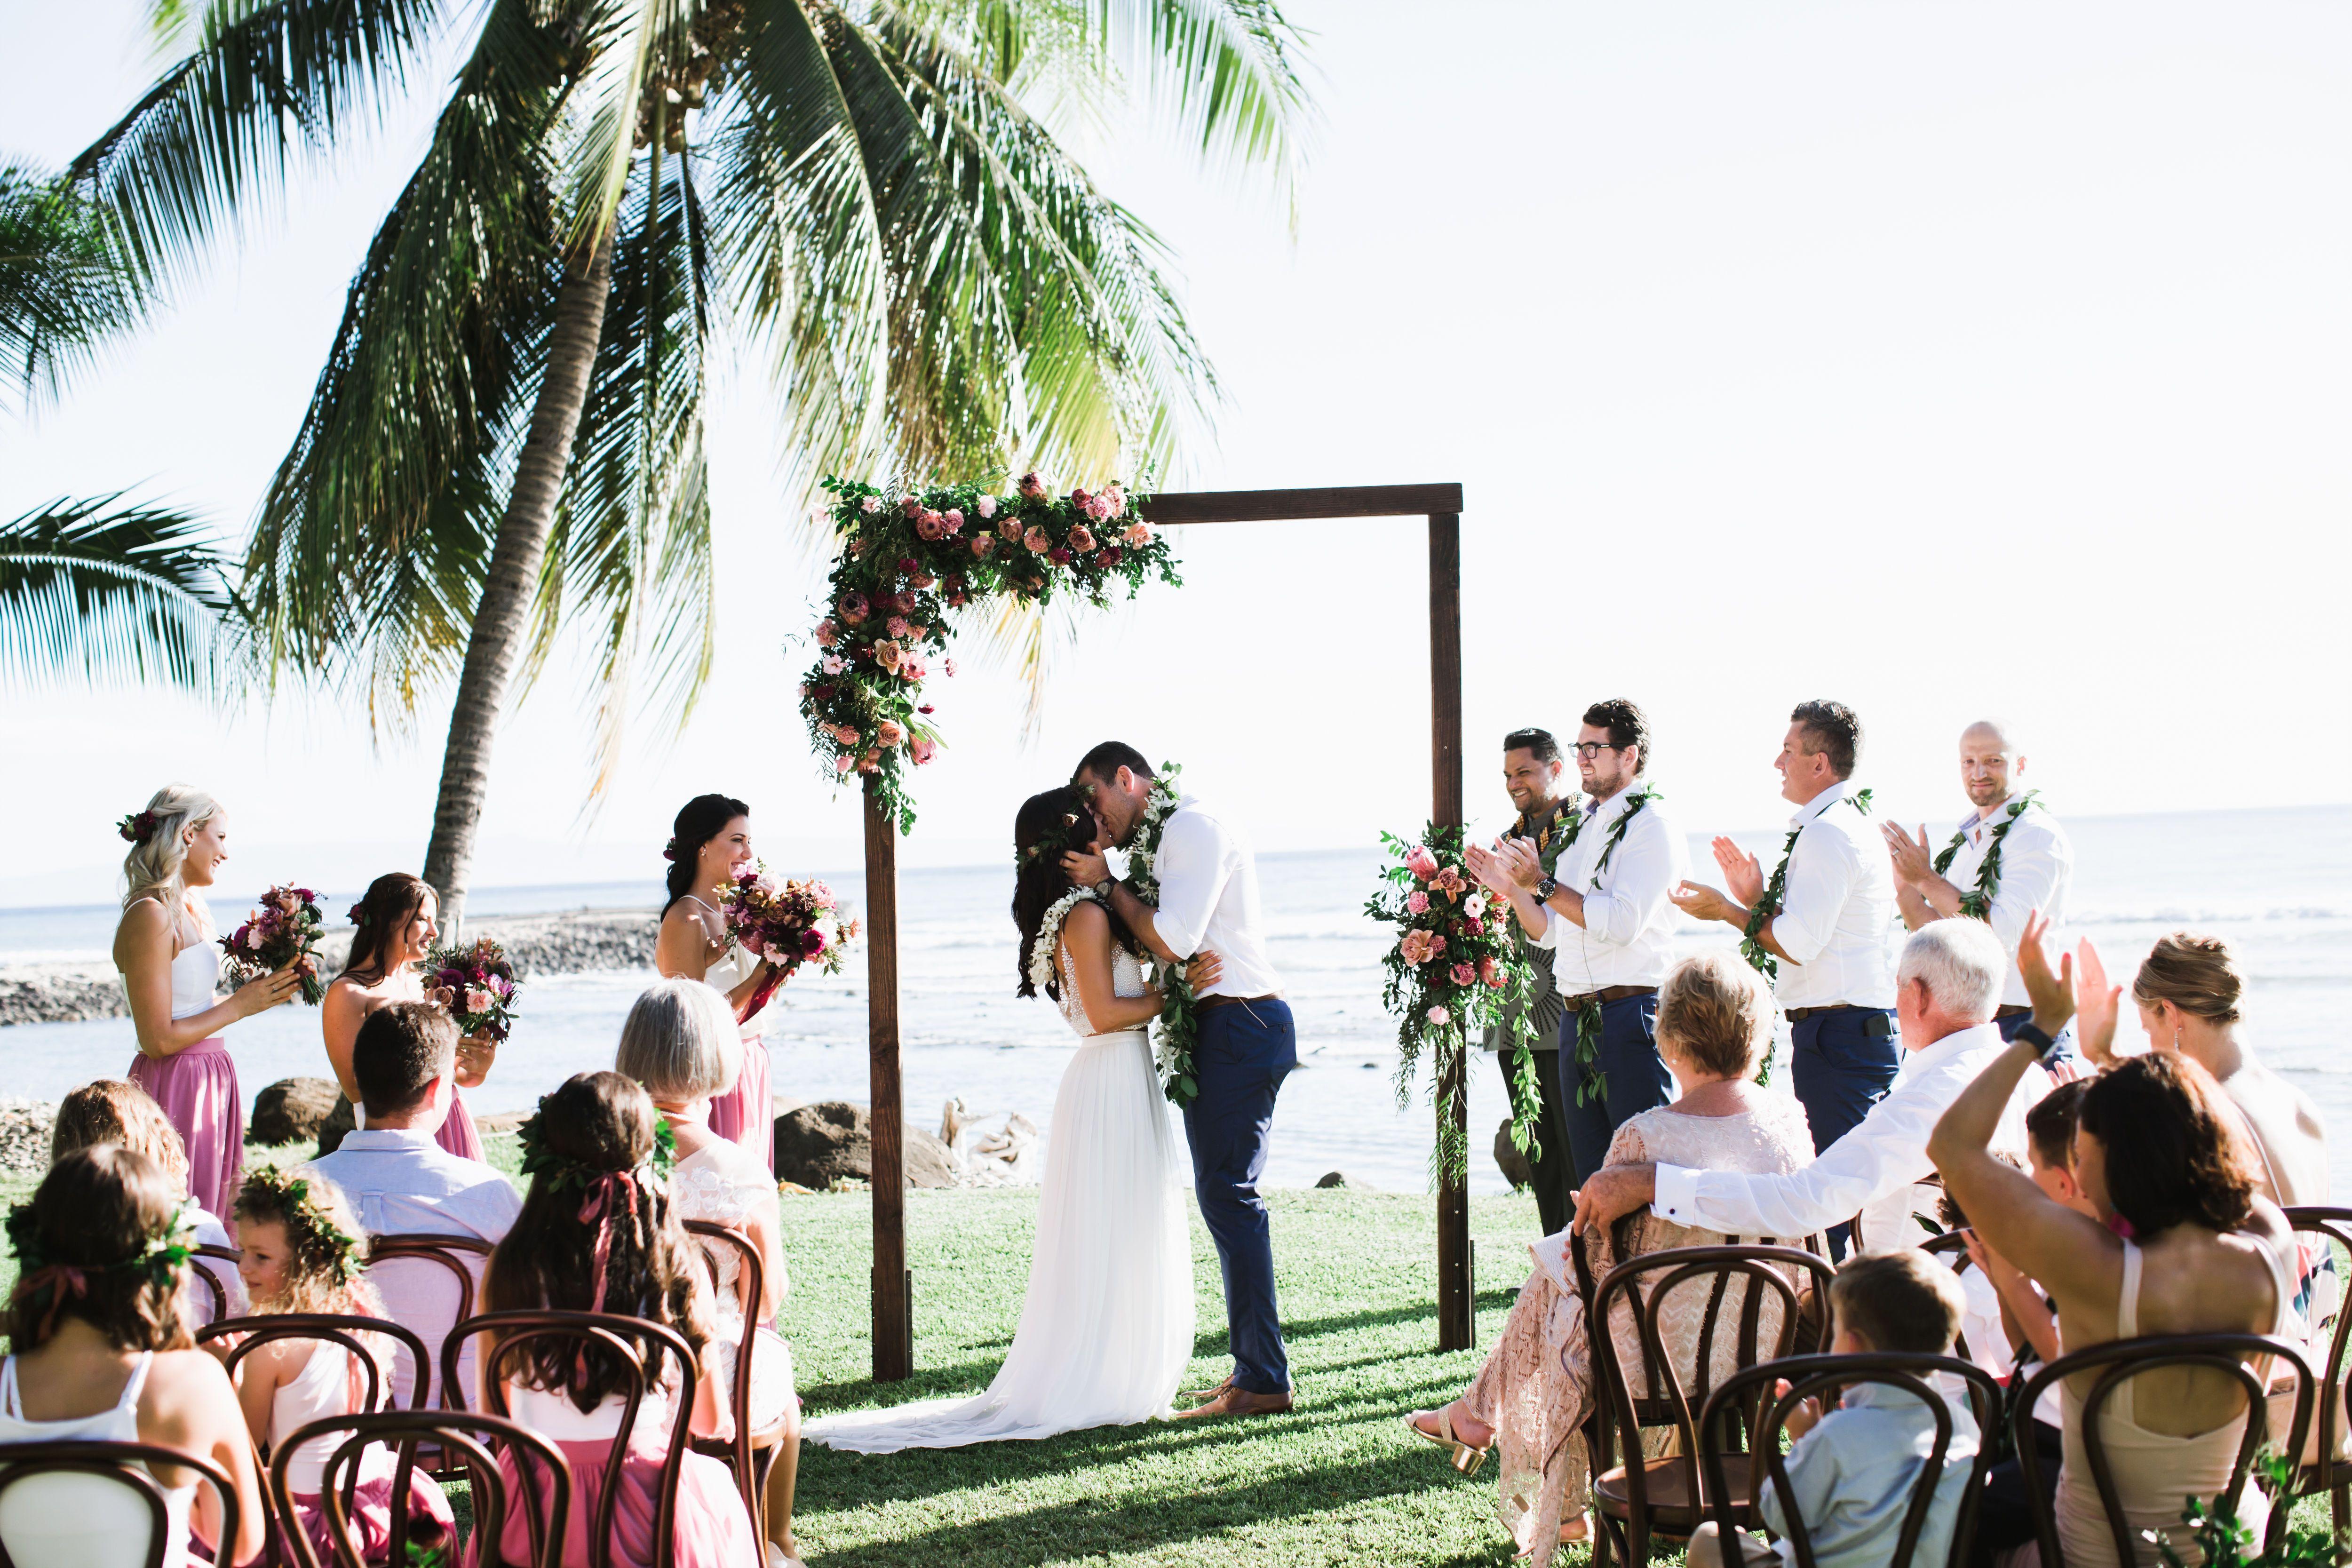 Hawaii Destination Wedding.Inspiration Events Hawaii Hawaii Destination Wedding Hawaii